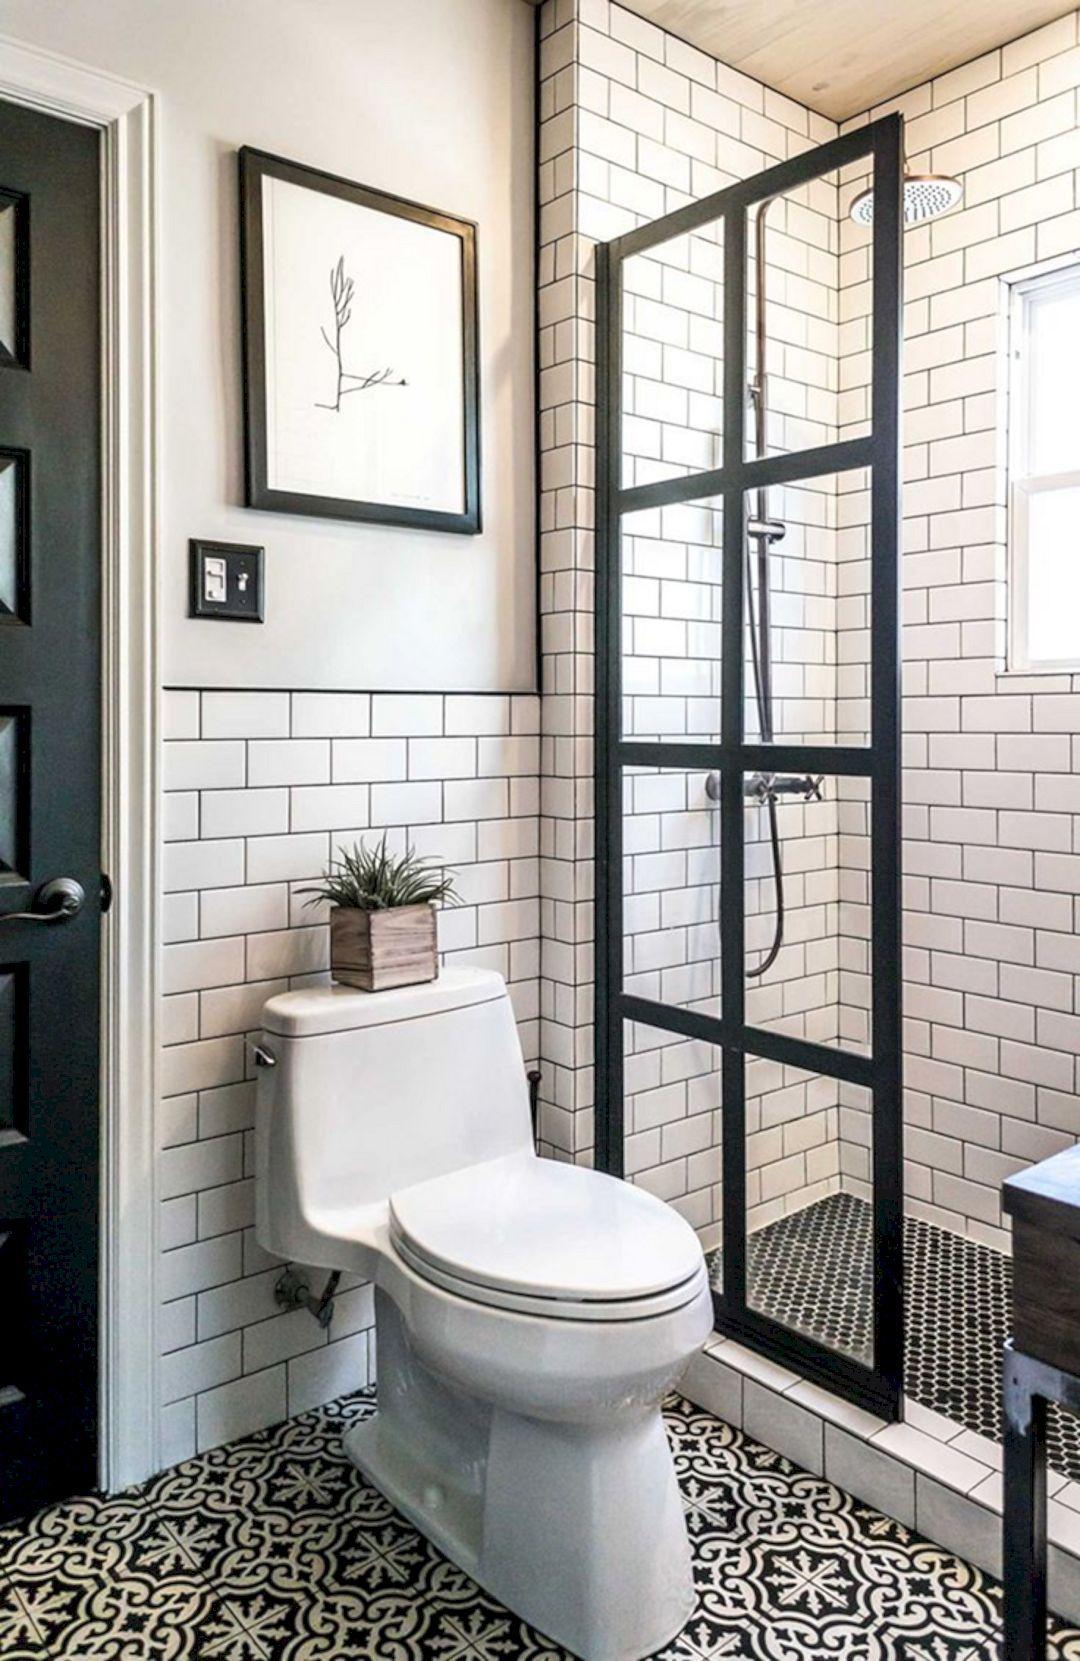 Stylish Modern Bathroom: 128 Best Designs Roundup | Kohler bathroom ...